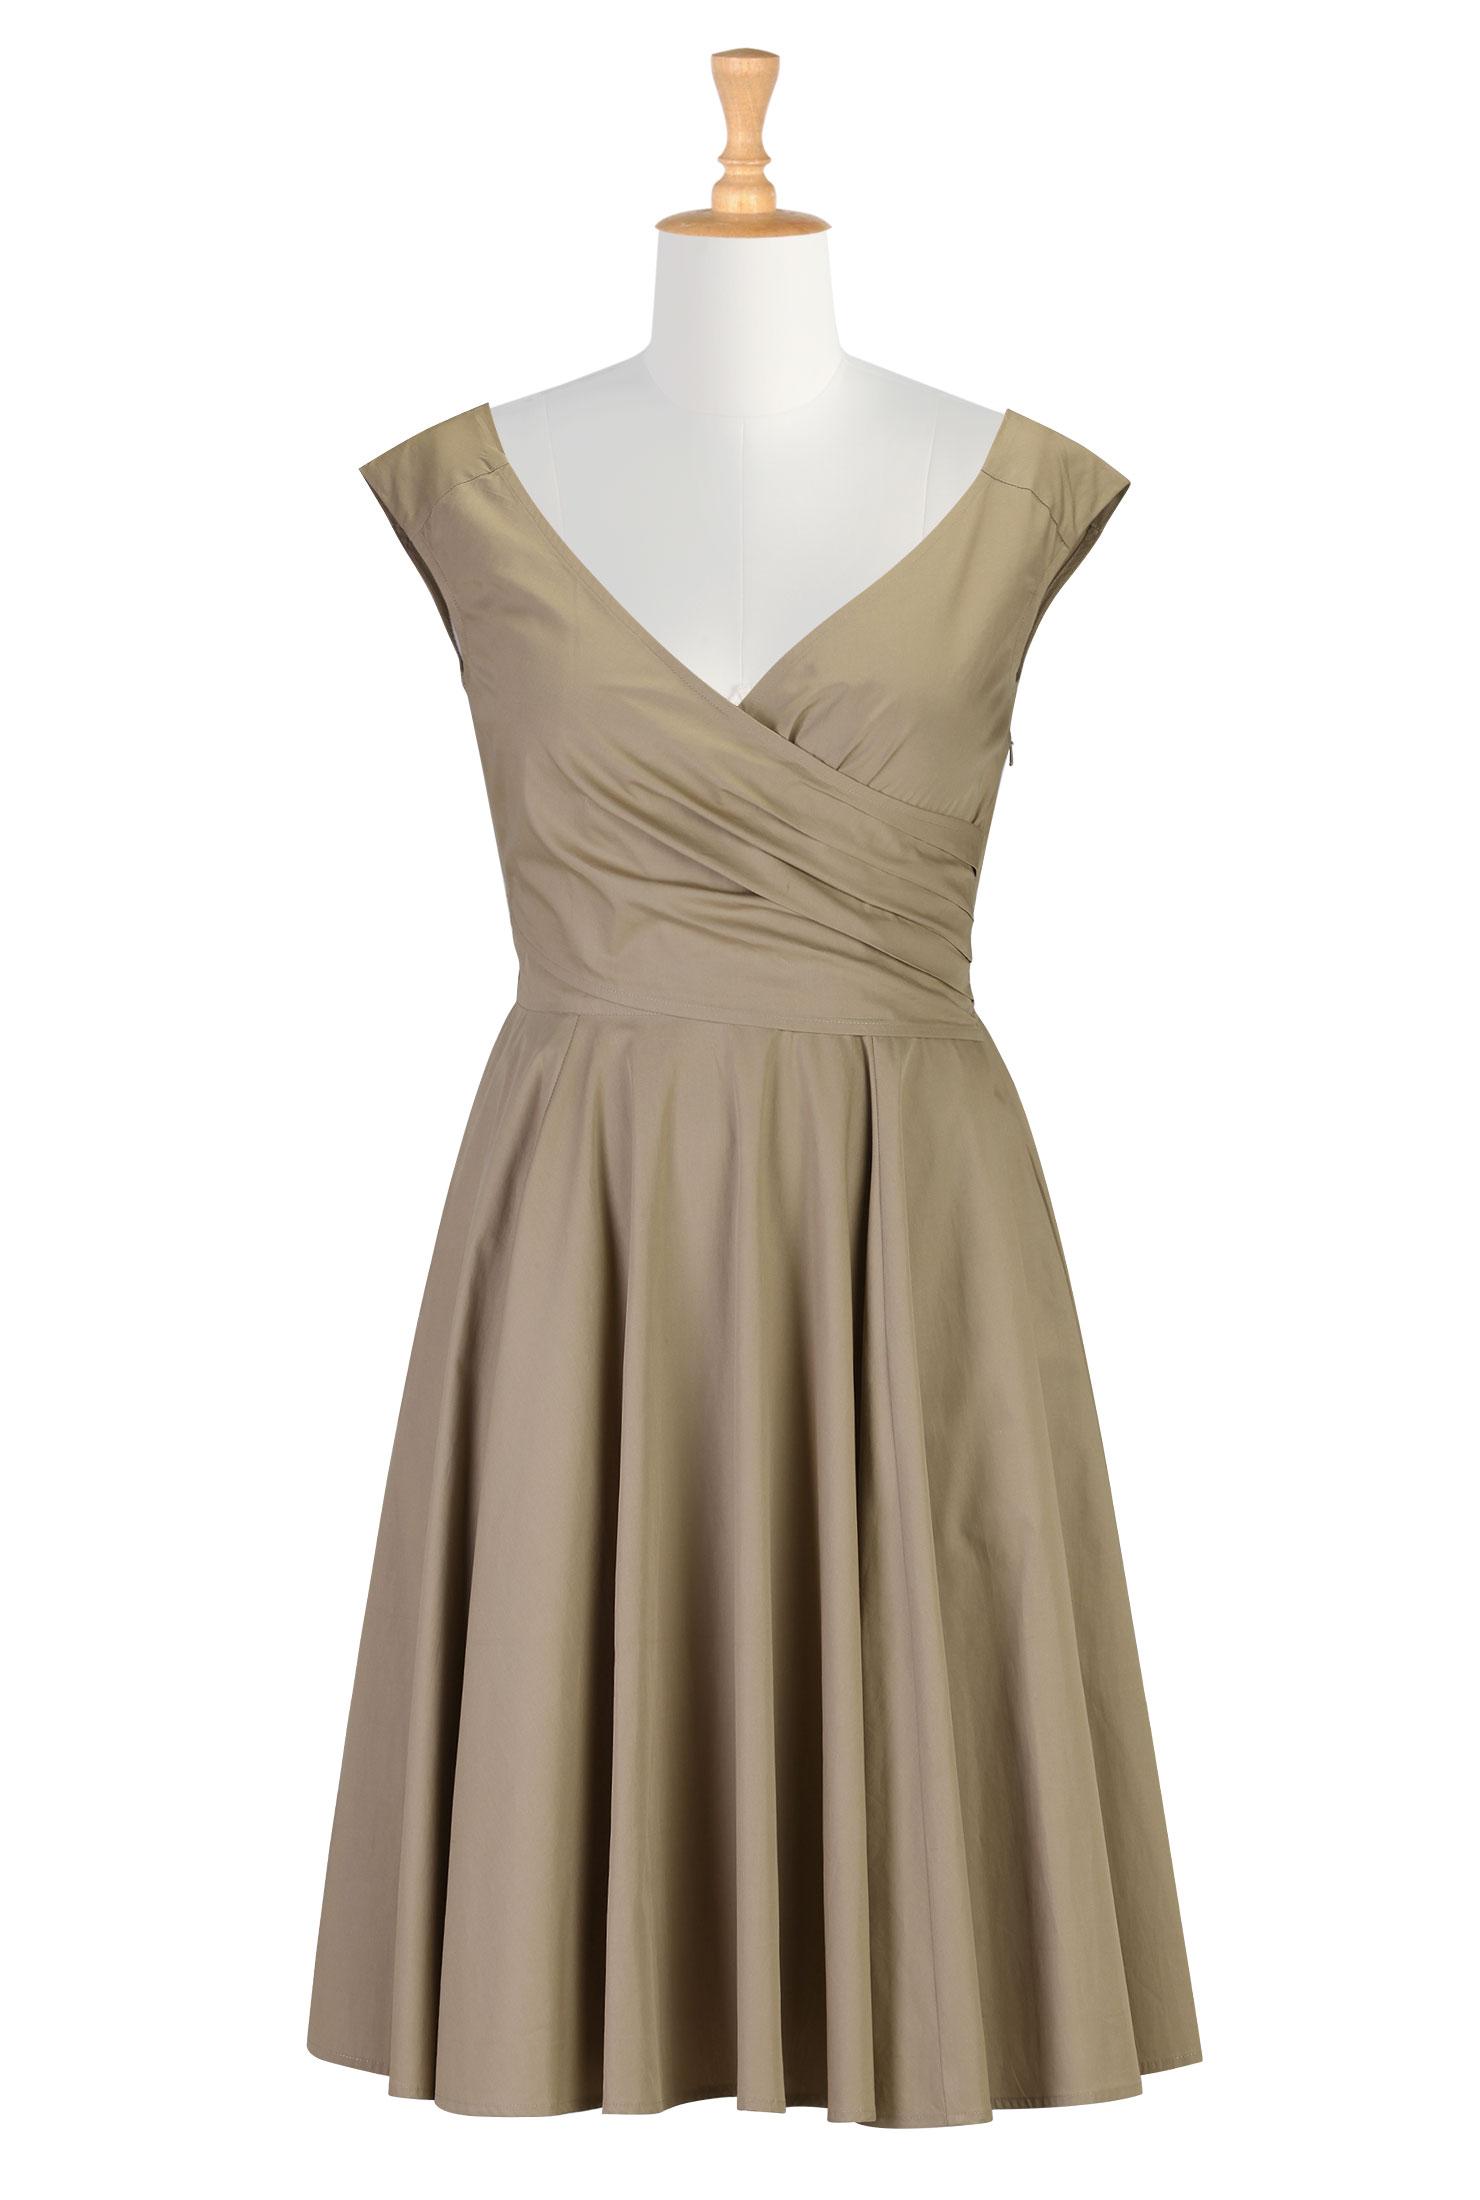 Beige Dress Picture Collection | DressedUpGirl.com